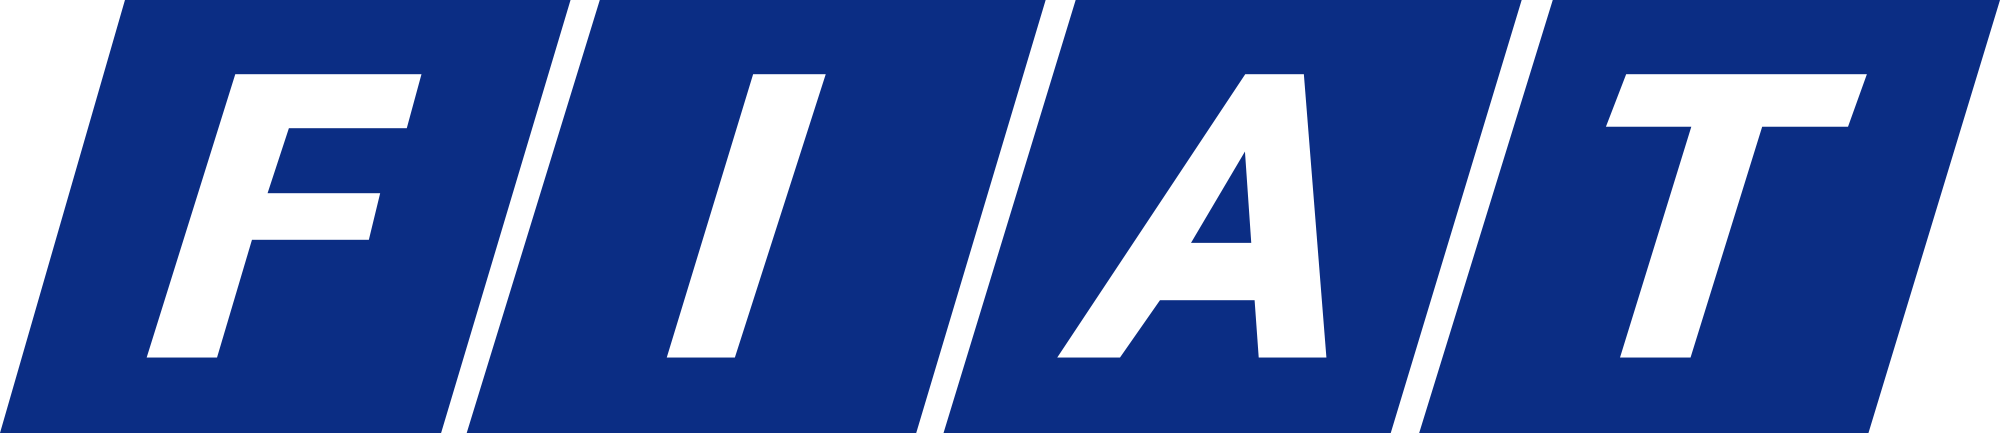 2000px-Fiat_logo_1968.svg_